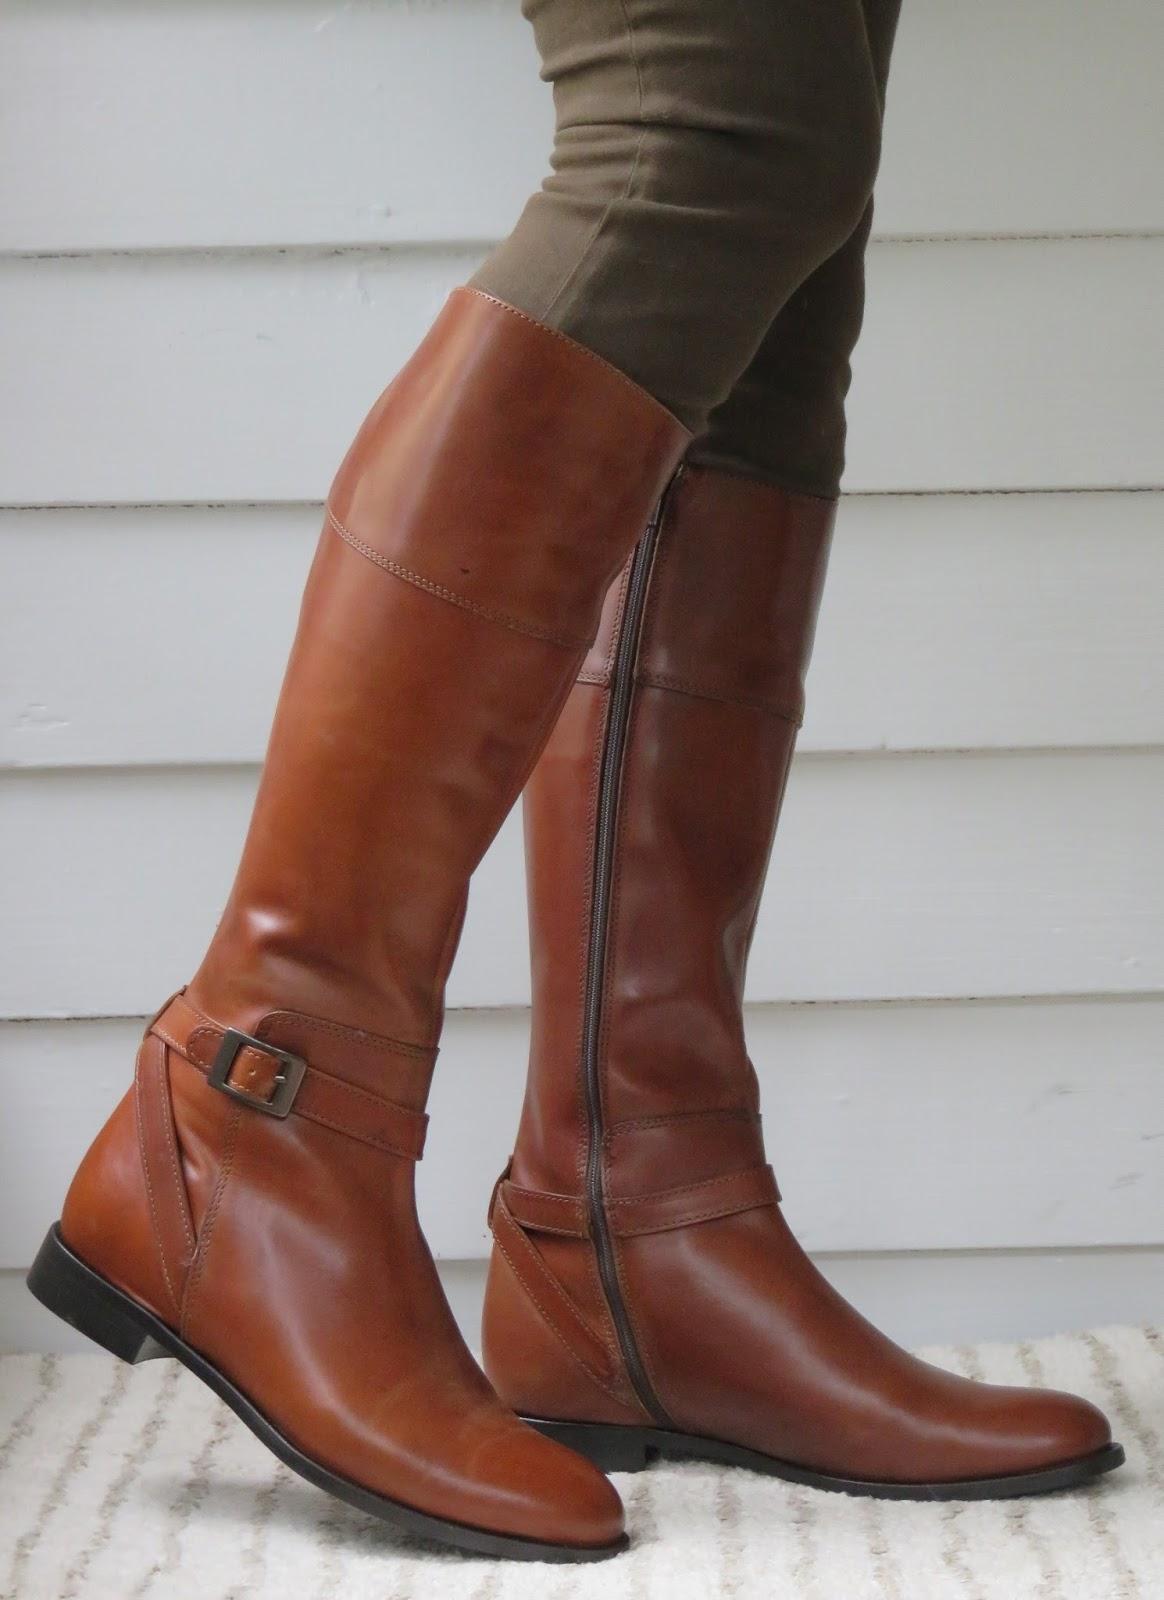 Howdy Slim! Riding Boots for Thin Calves: Narrow Calf Riding Boots ...